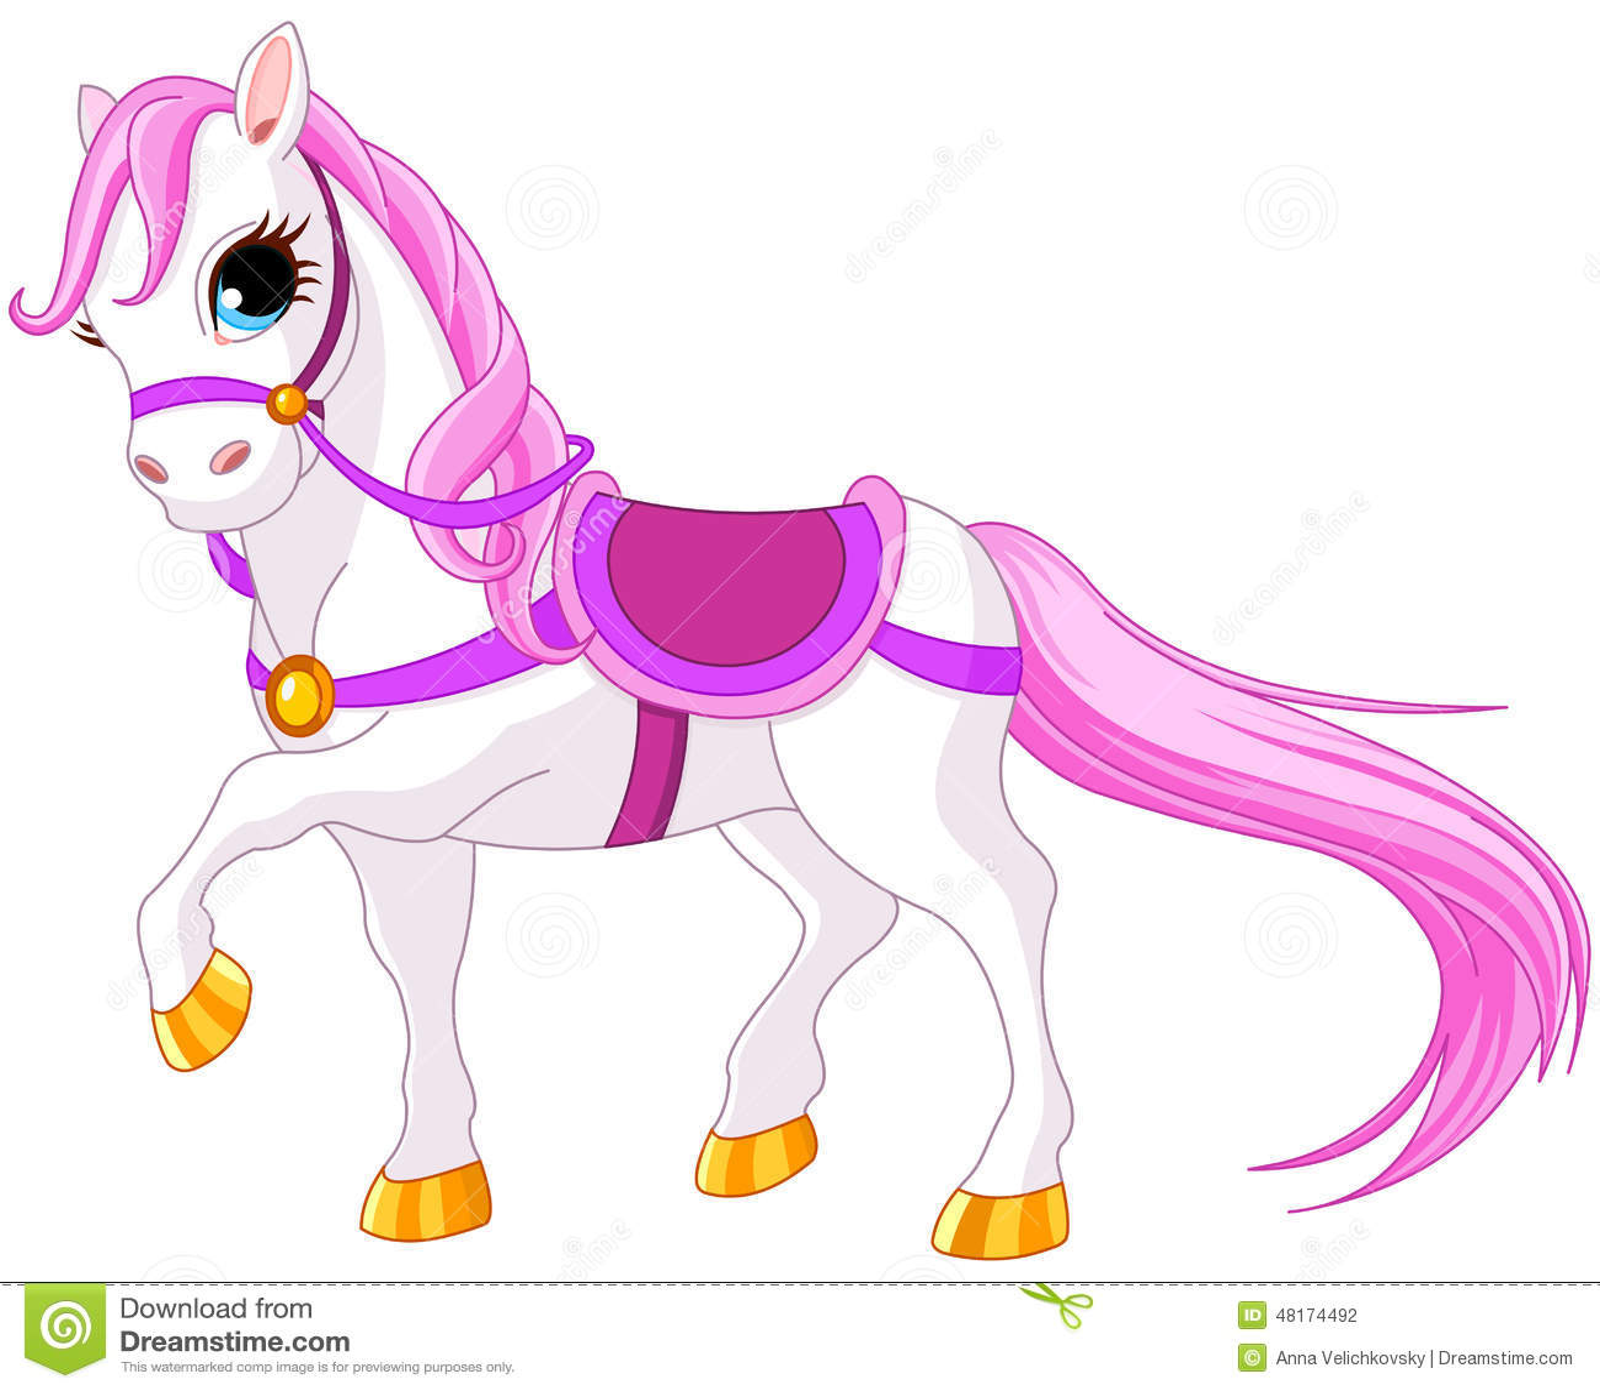 princess horse